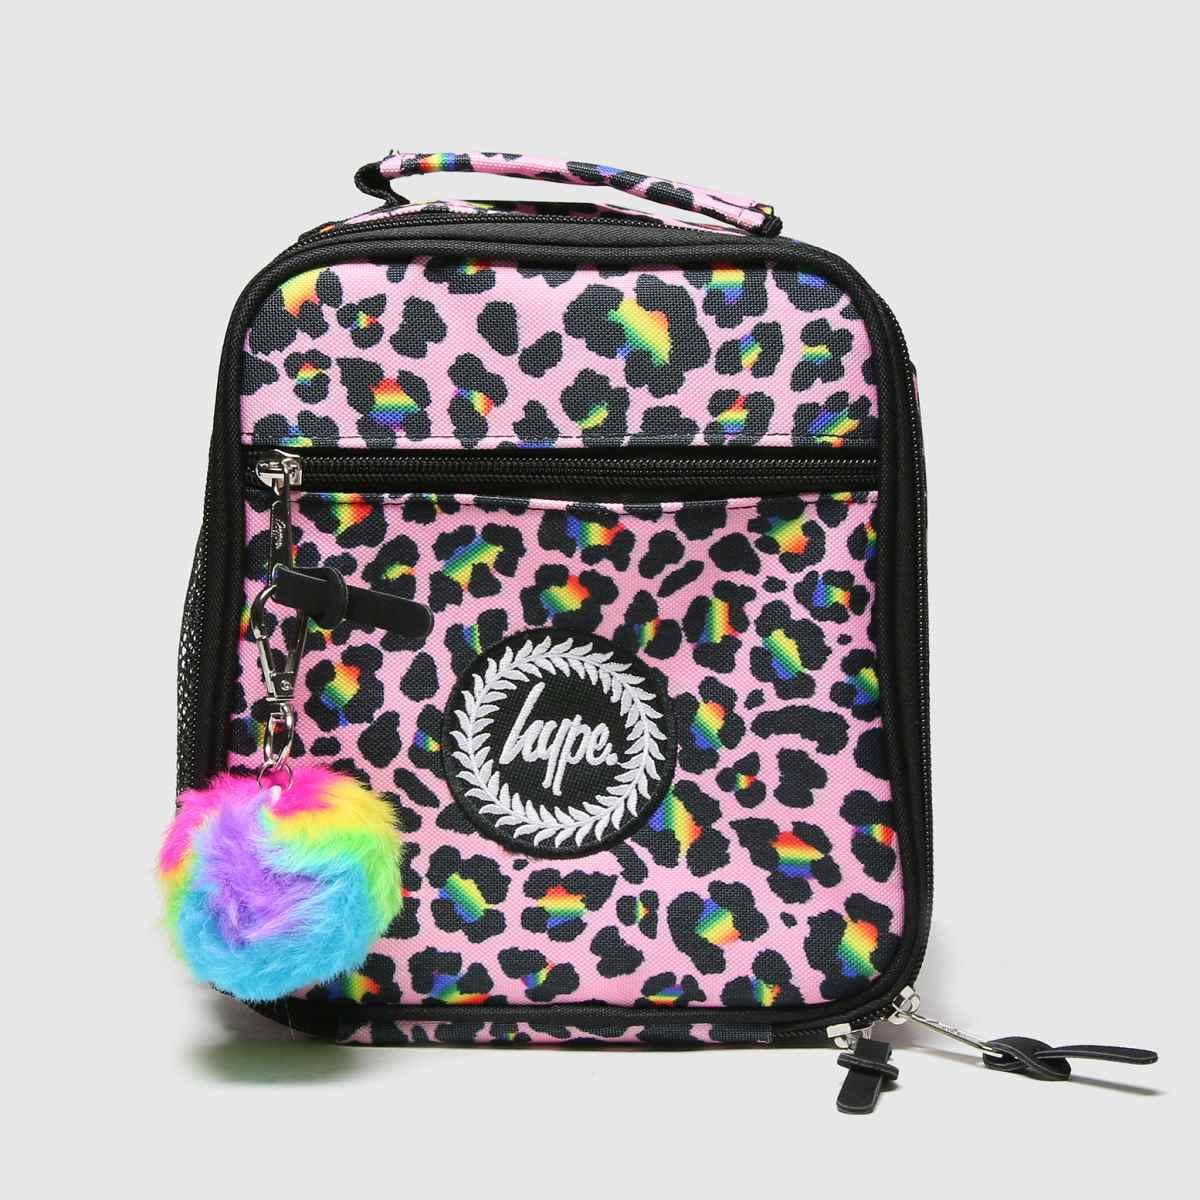 Accessories Hype Multi Rainbow Leopard Lunchbox